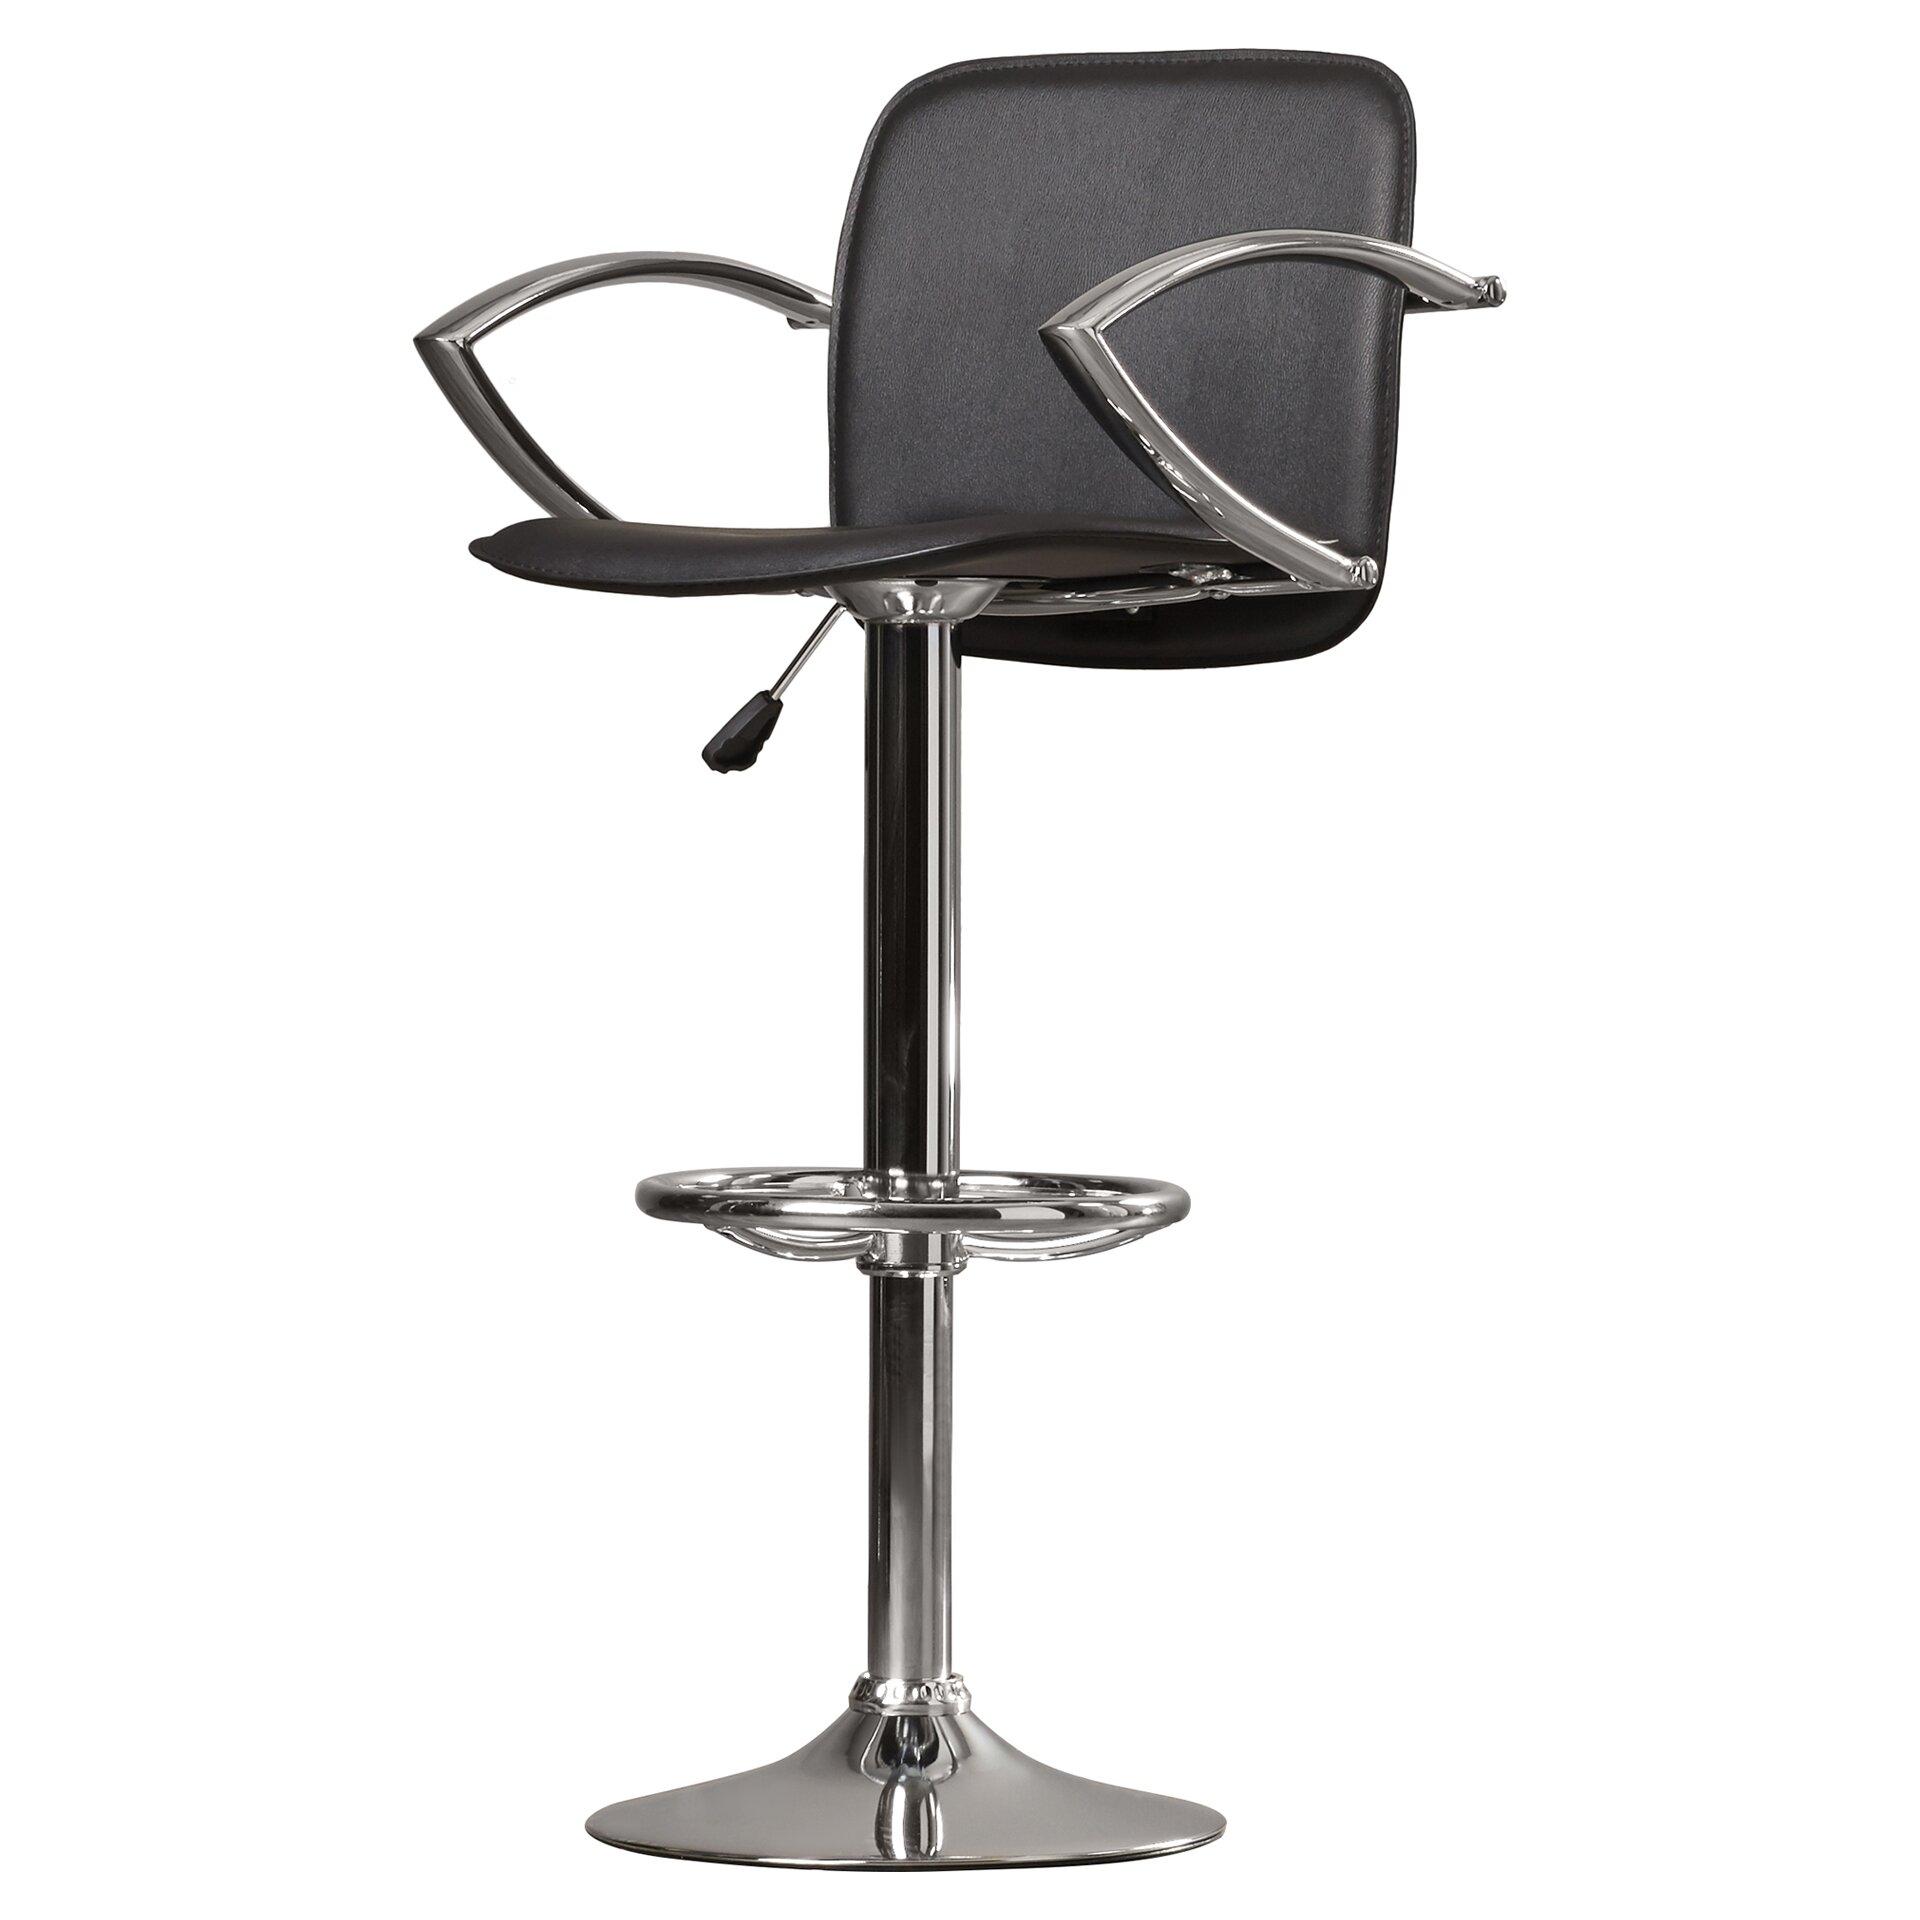 adjustable height swivel bar stool. Wade Logan Shain Adjustable Height Swivel Bar Stool